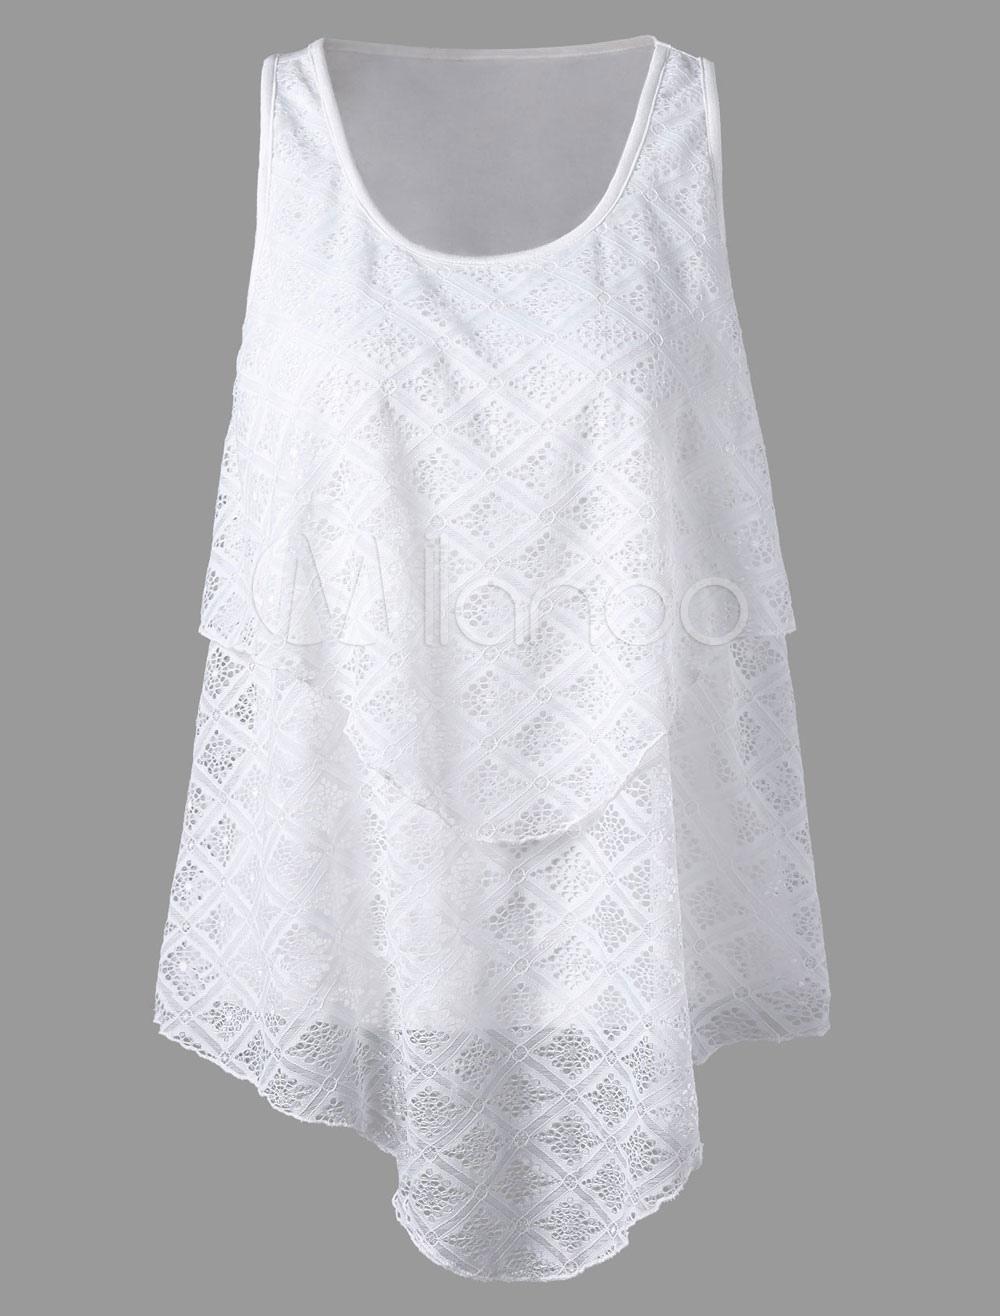 White Cami Top U Neck Sleeveless Lace Chiffon Layered Women's Summer Tops